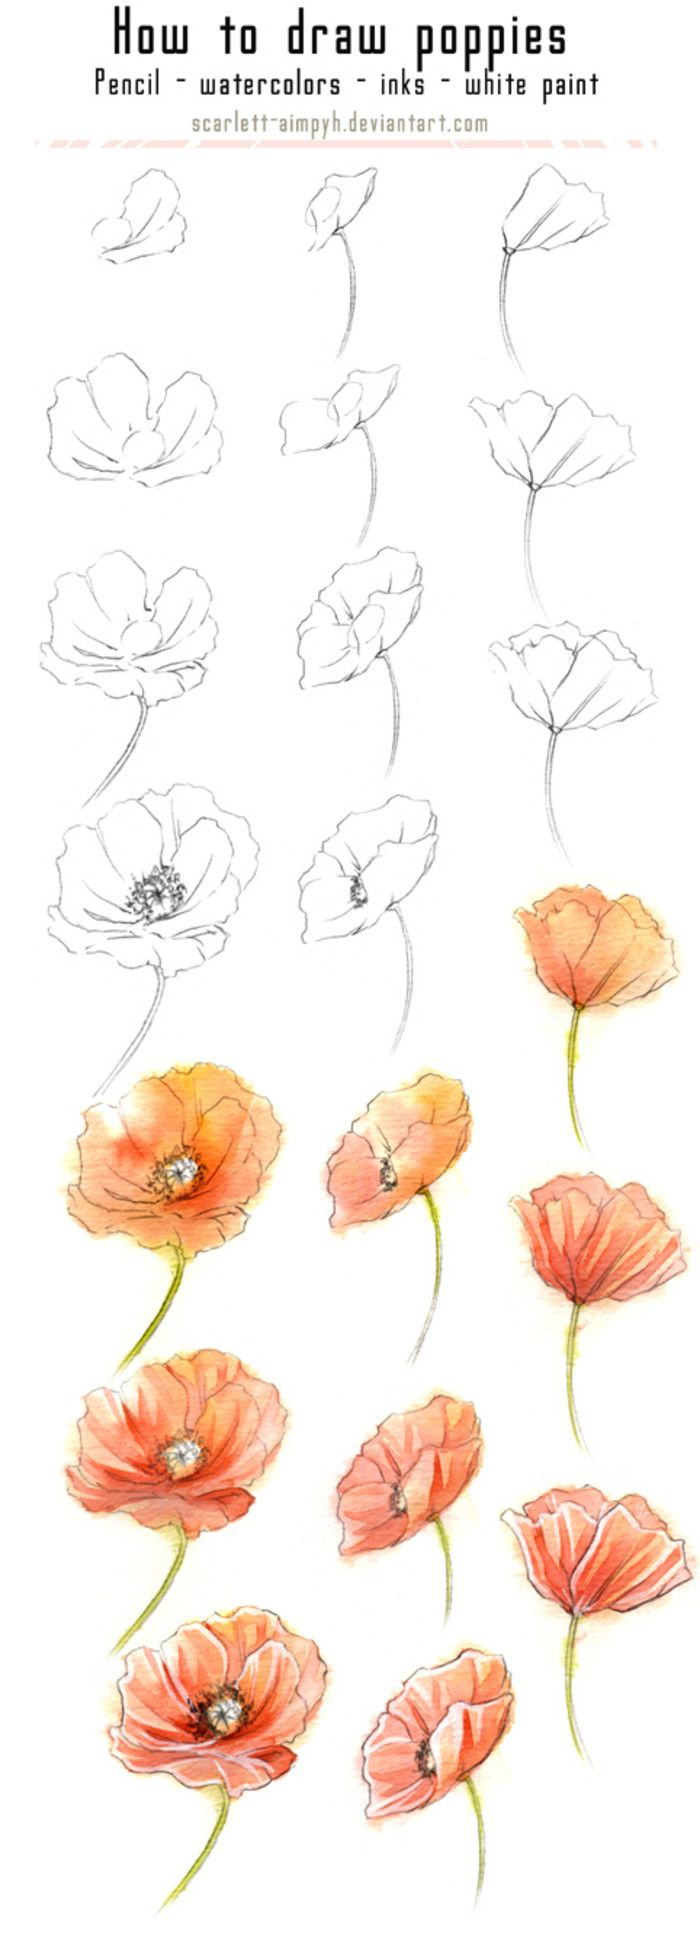 125  Dibujar Y Pintar Amapolas Por Scarlettaimpyh Flower Drawingsdrawing  Flowersflower Paintingspoppy Drawinghow